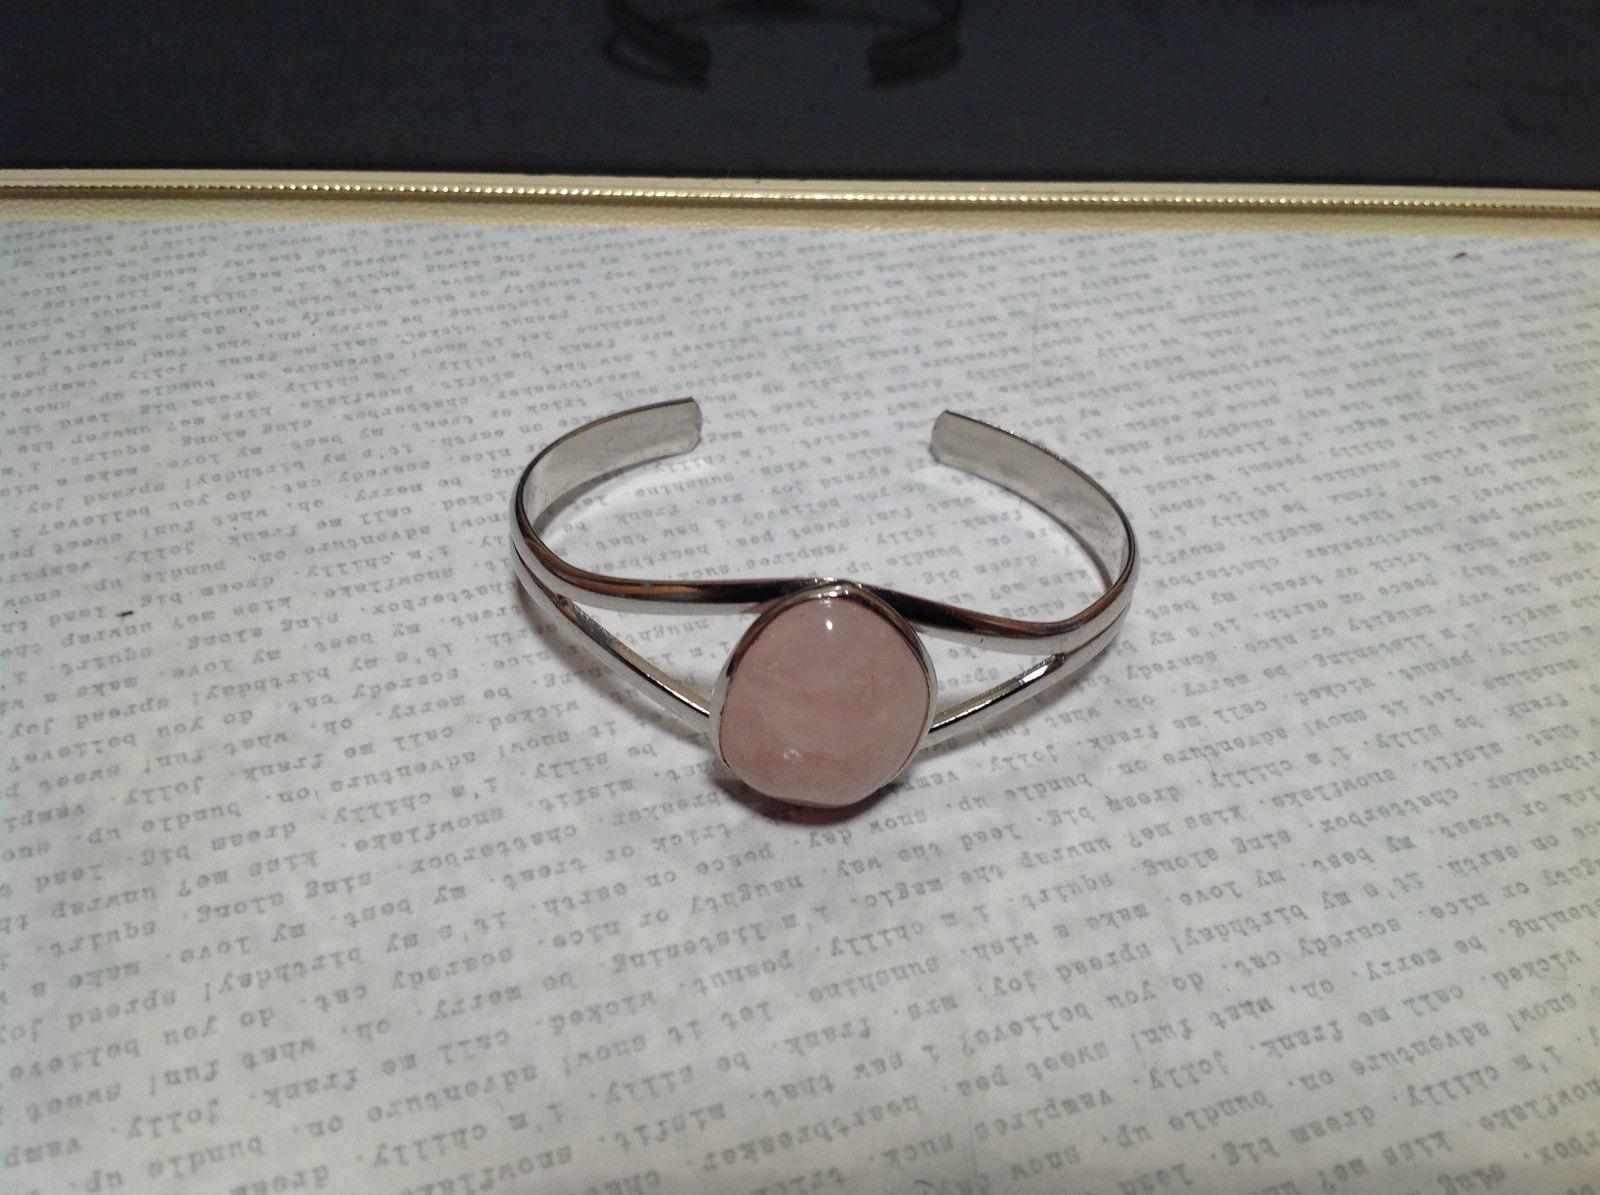 Silver Tone Geo Jewelry Bracelet with Light Pink Stone Oval Shape